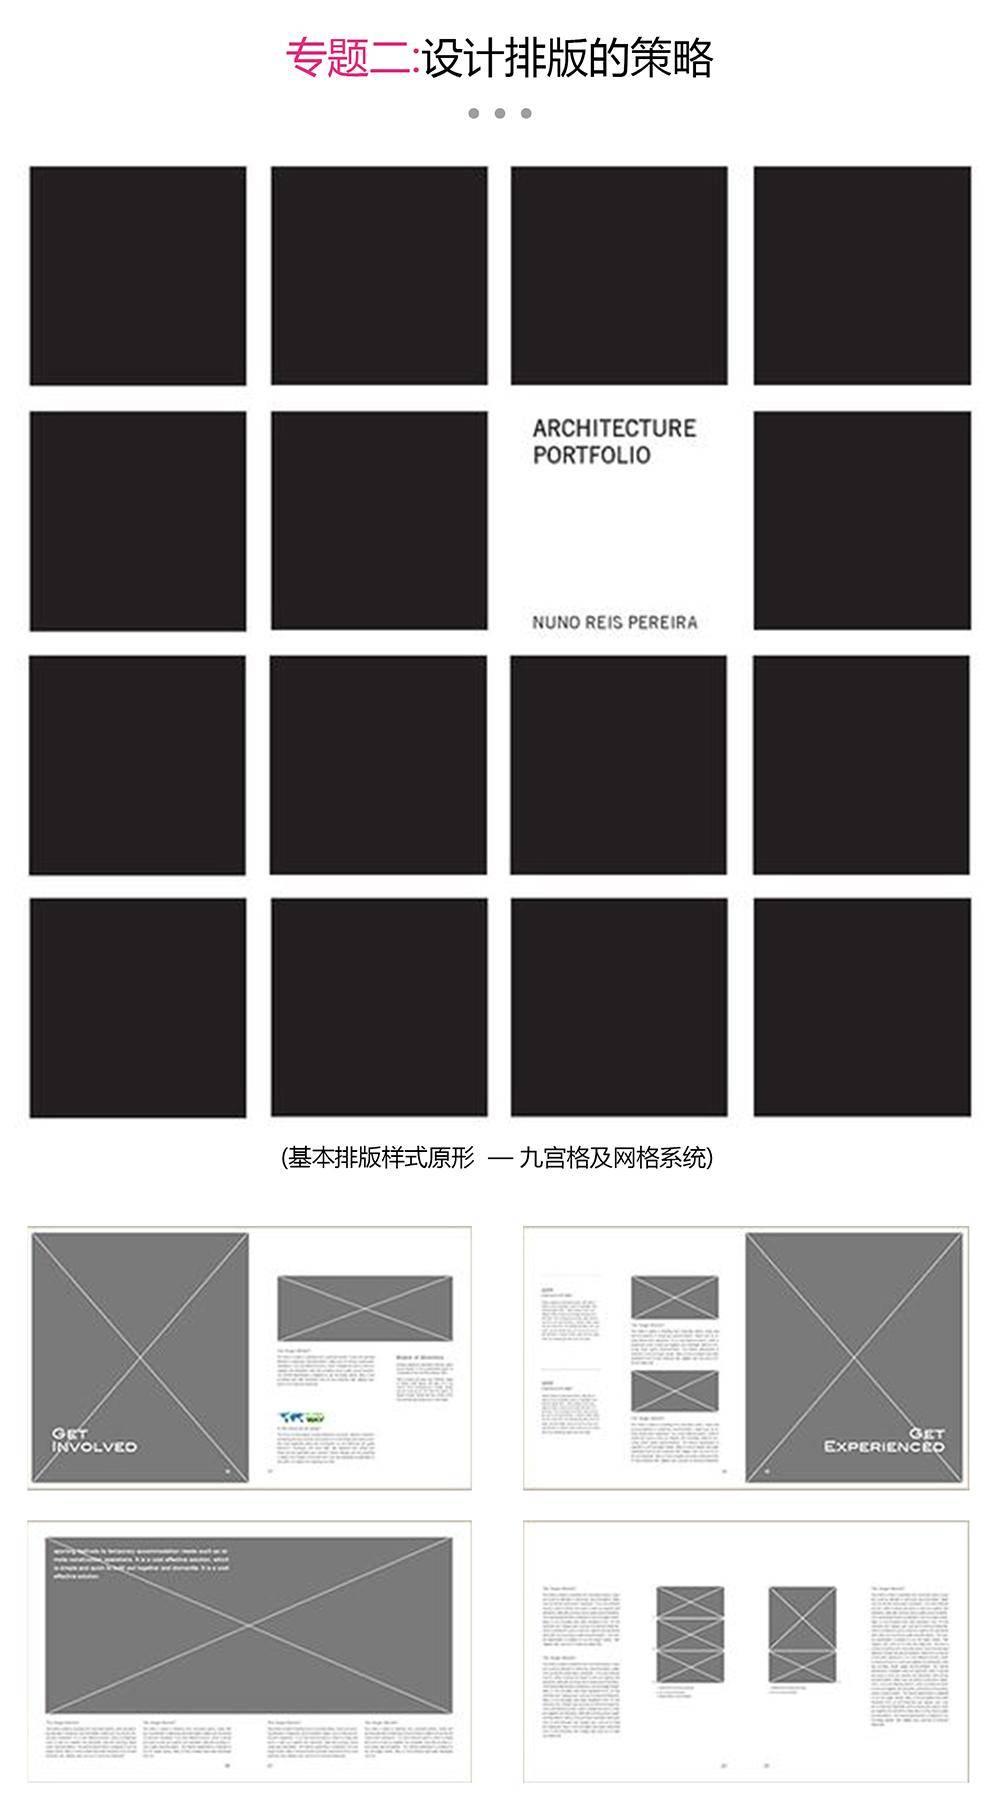 4/28 indesign排版与设计研习班图片